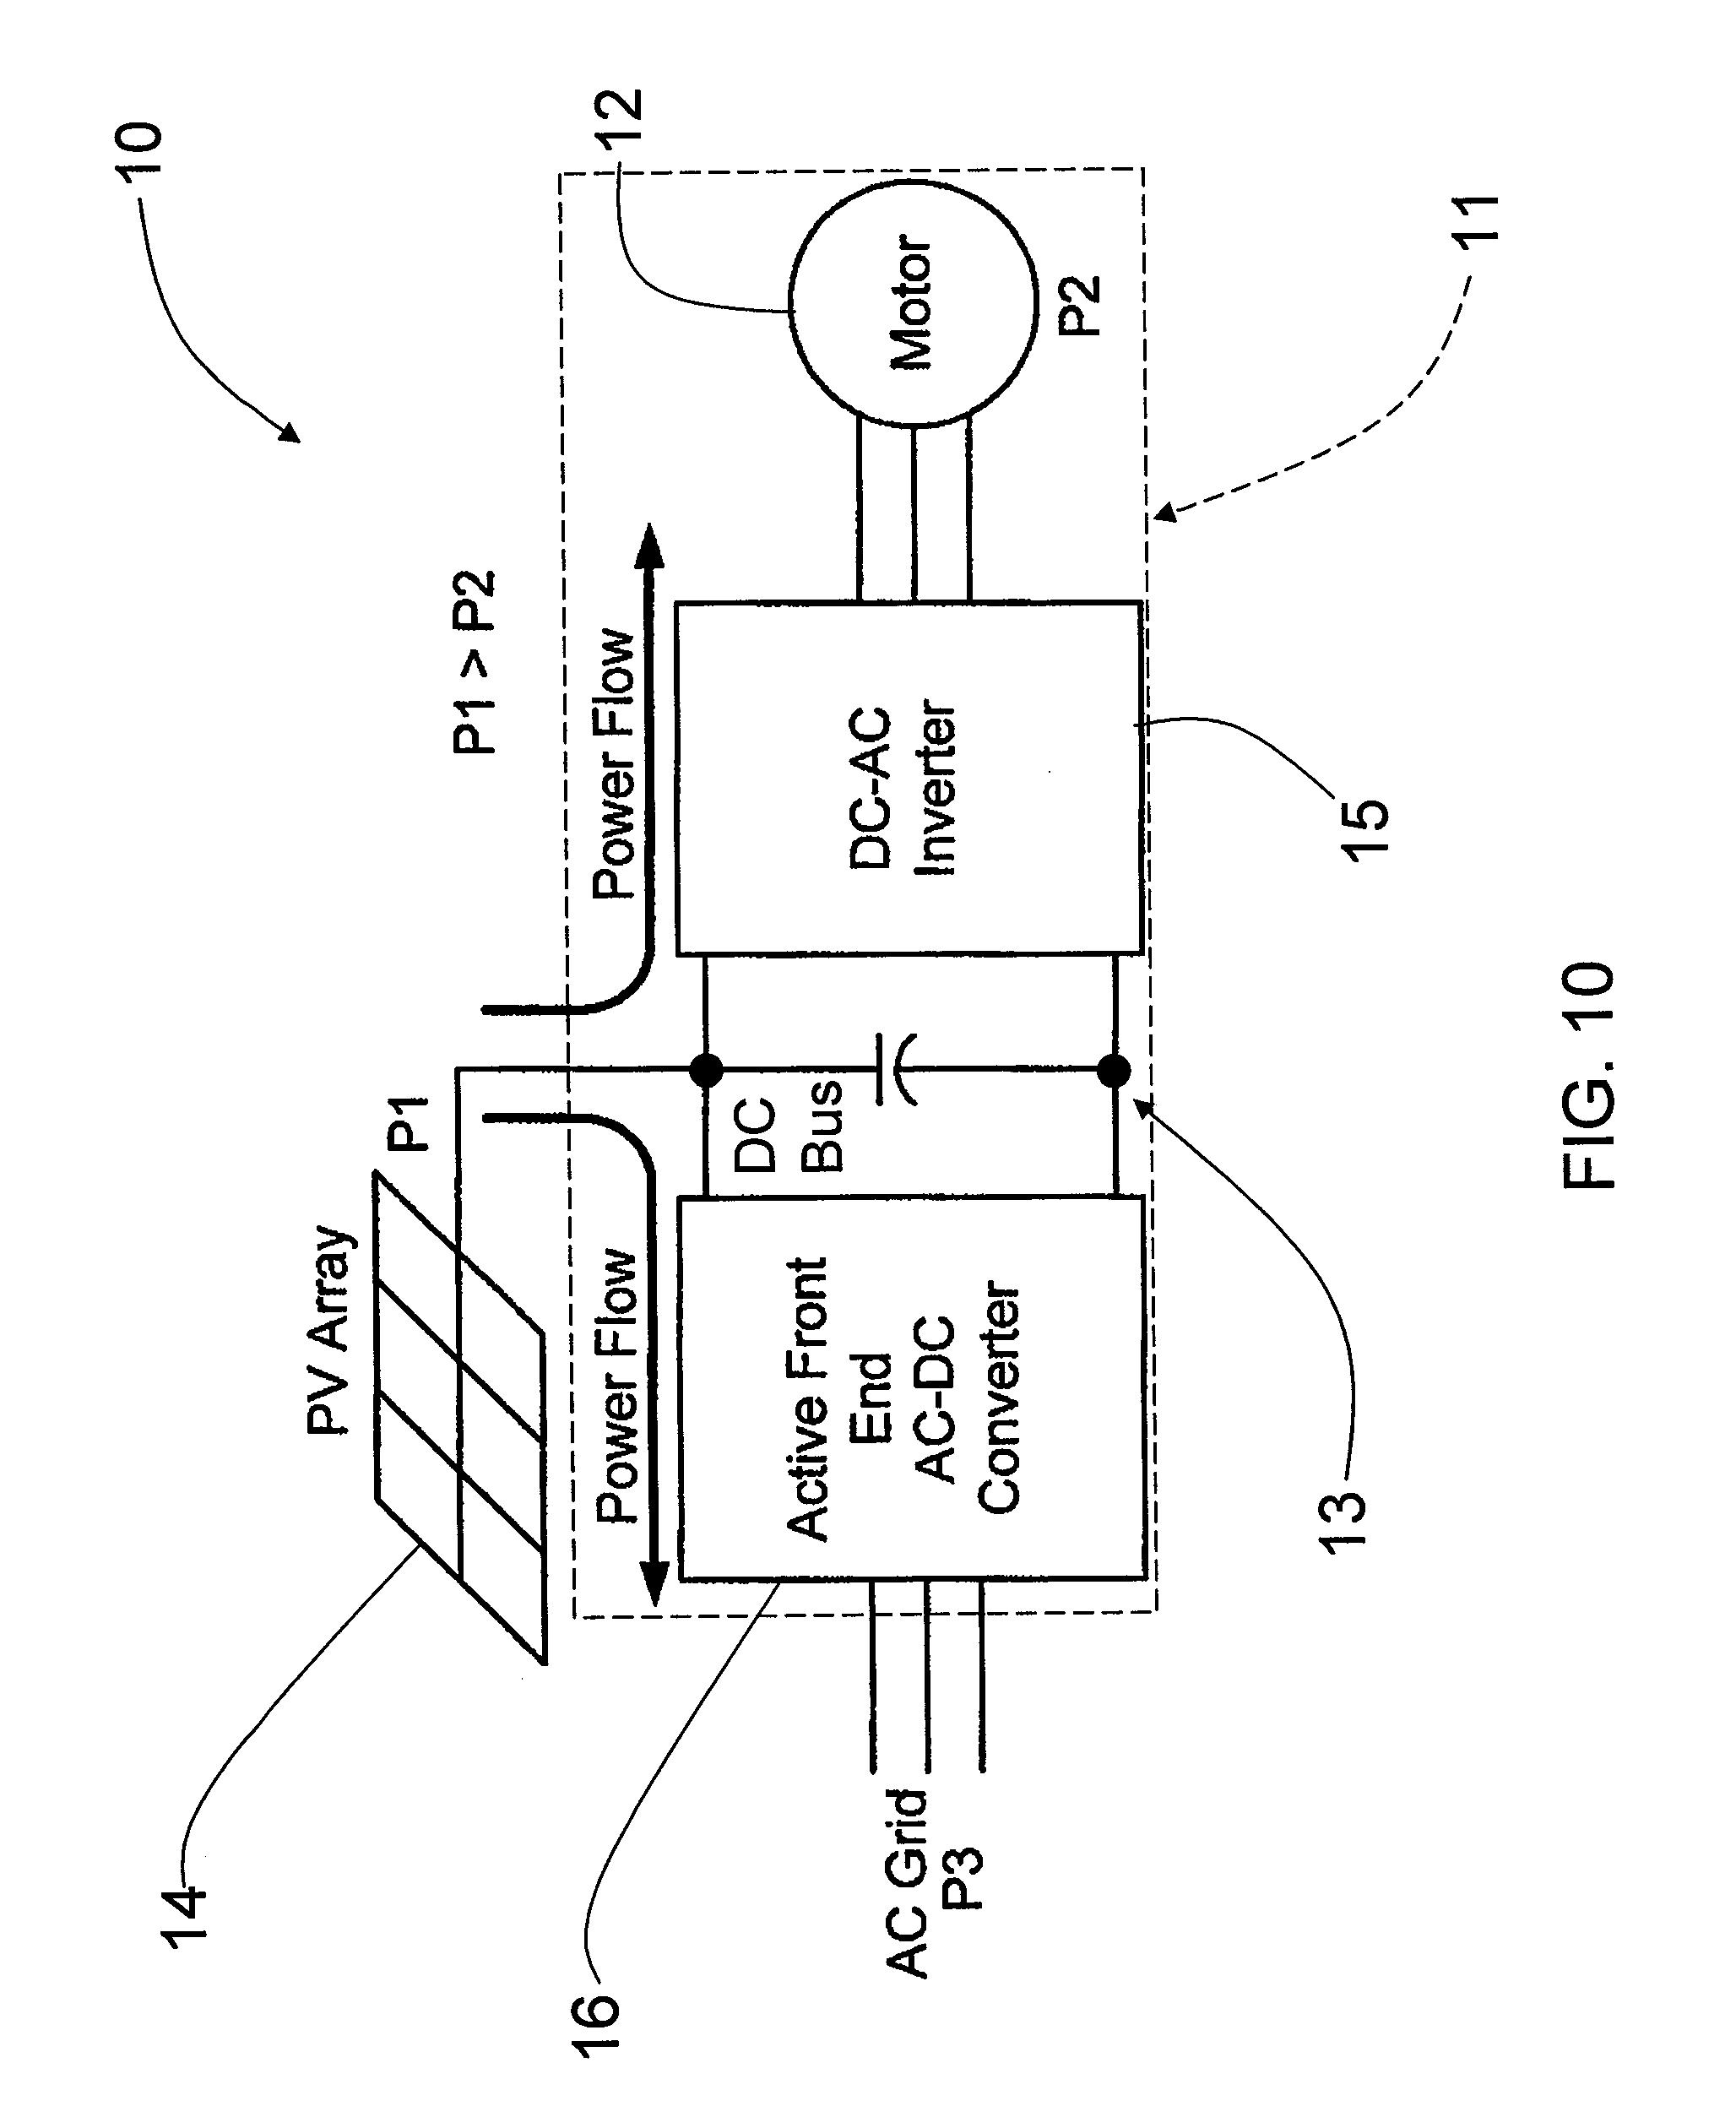 Pressor Potential Relay Wiring Diagram Diagrams Wiring Diagram Images